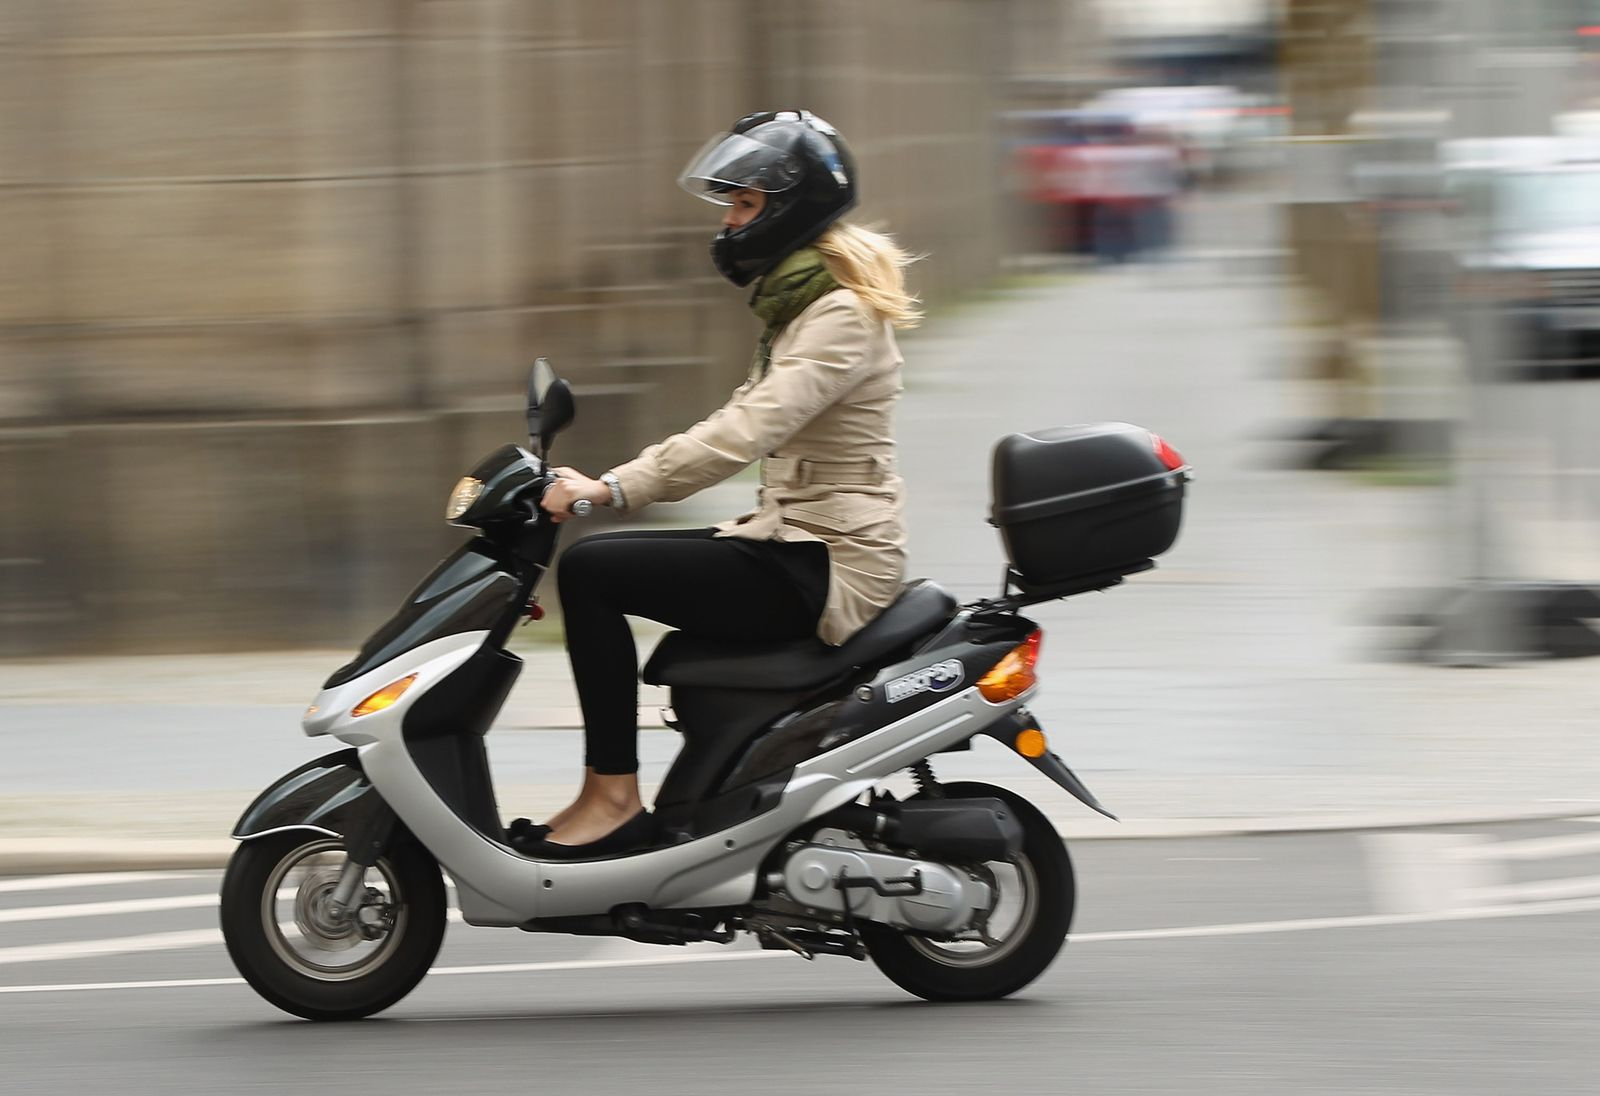 Moped / Symbol